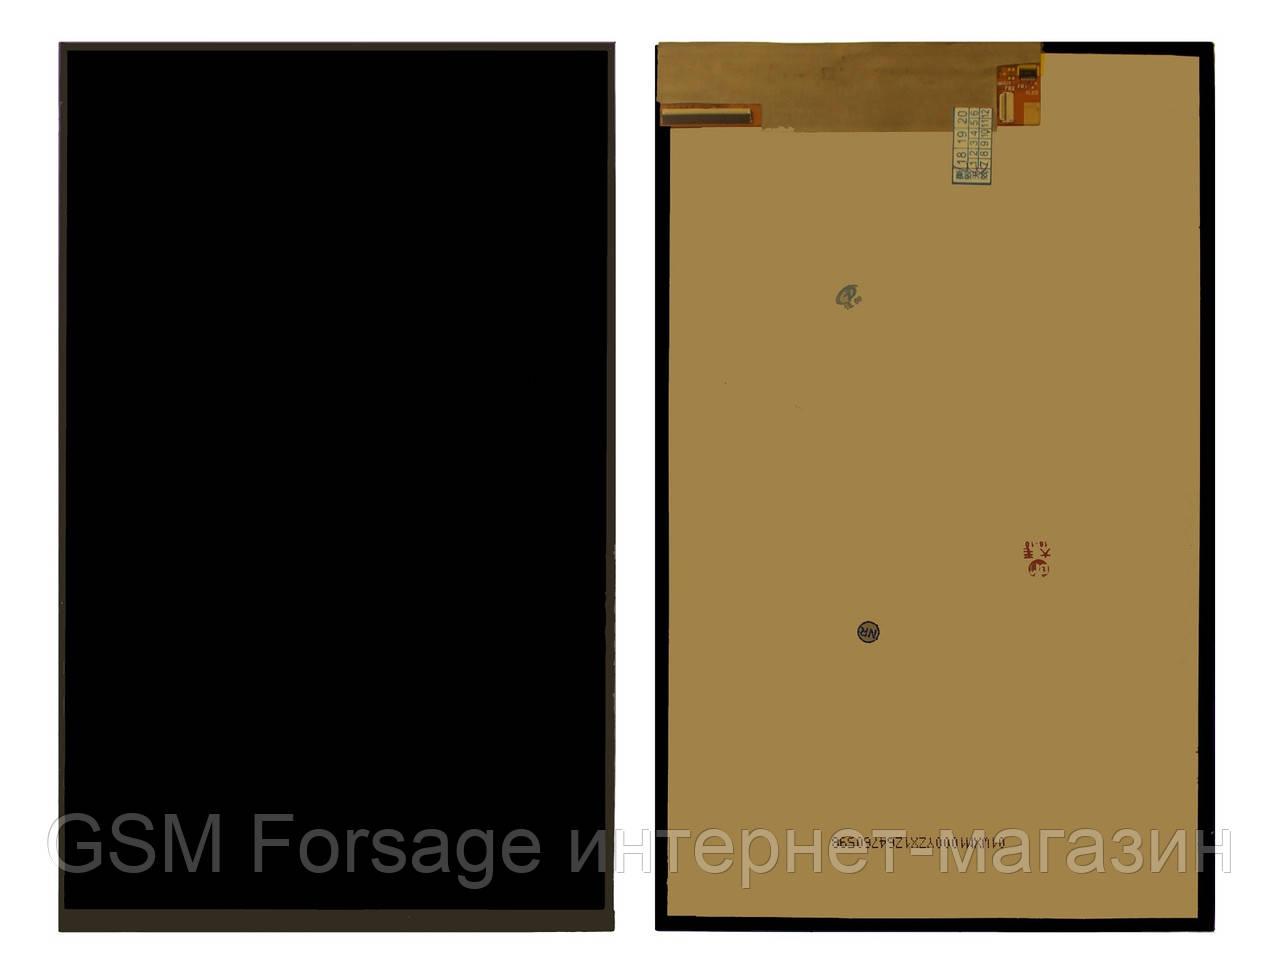 Дисплей Asus ZenPad (10) (Z300C, Z300CG, P021, P023) only LCD (жовтий шлейф)